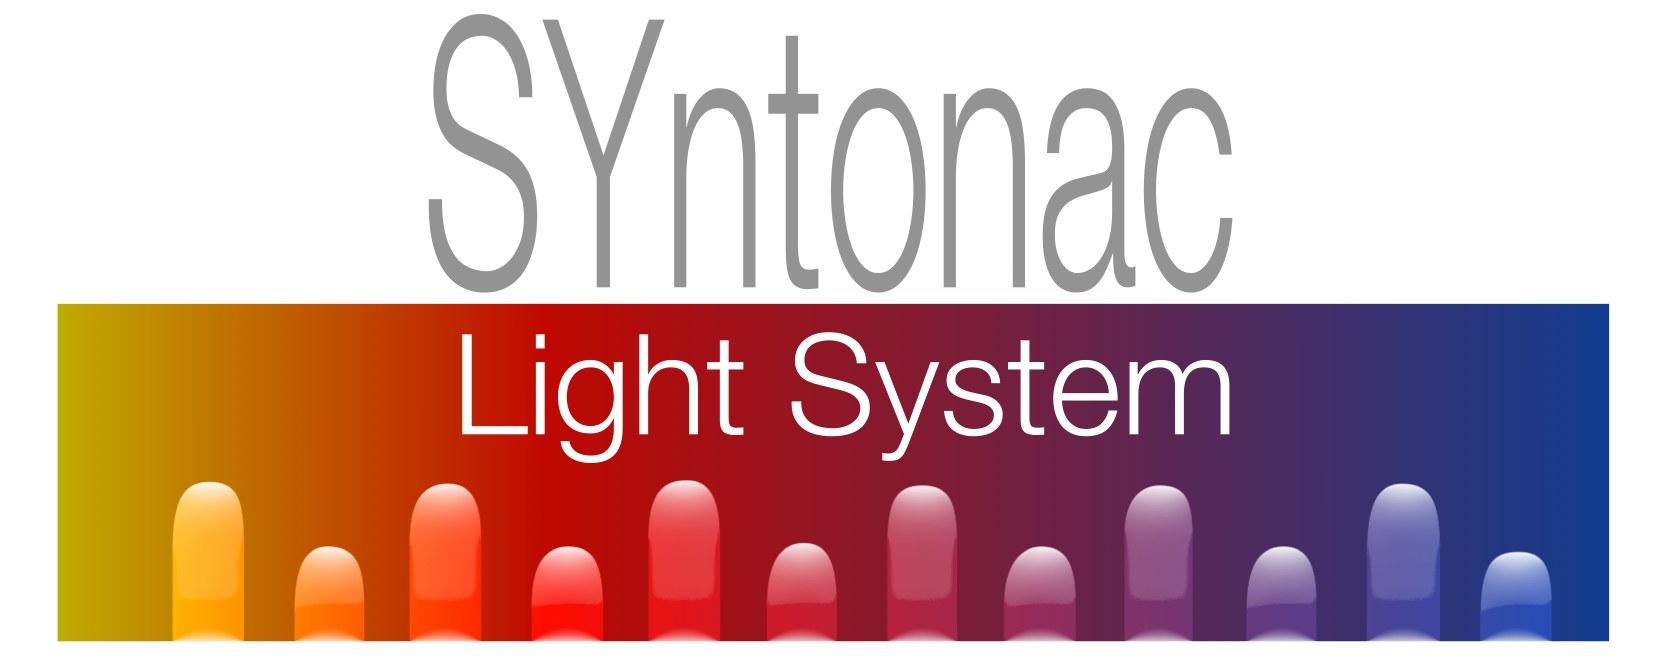 SYntonac1.1.22